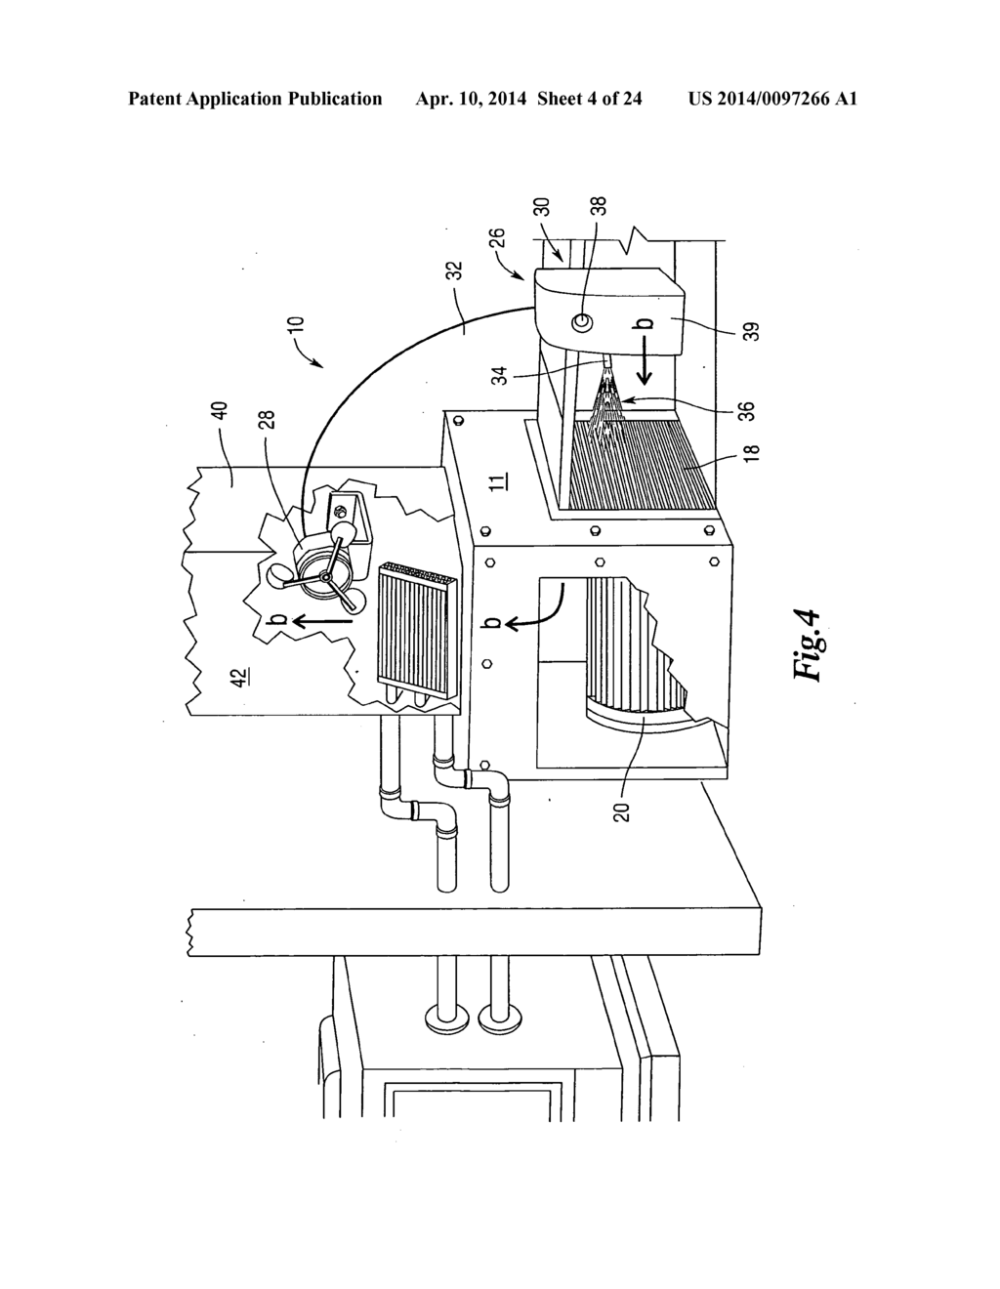 medium resolution of scent disperser arrangement in an hvac system diagram schematic and image 05